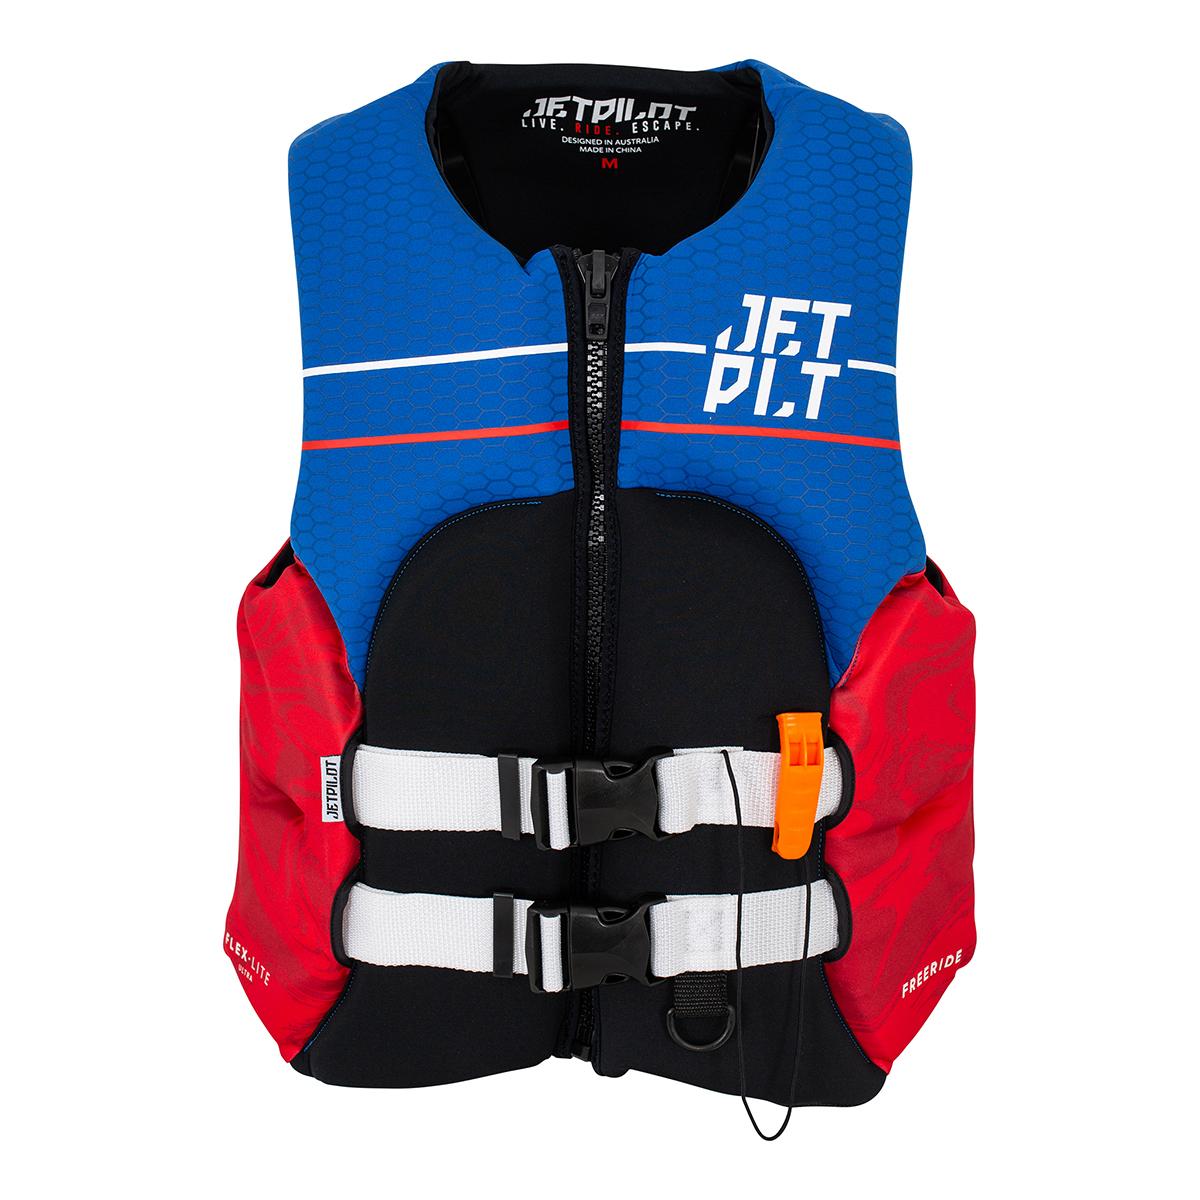 JETPILOT(ジェットパイロット)2021モデルFREERIDE F/E NEO CGA VEST(RED)ライフジャケット-JCI予備検査承認#JA21113CGA